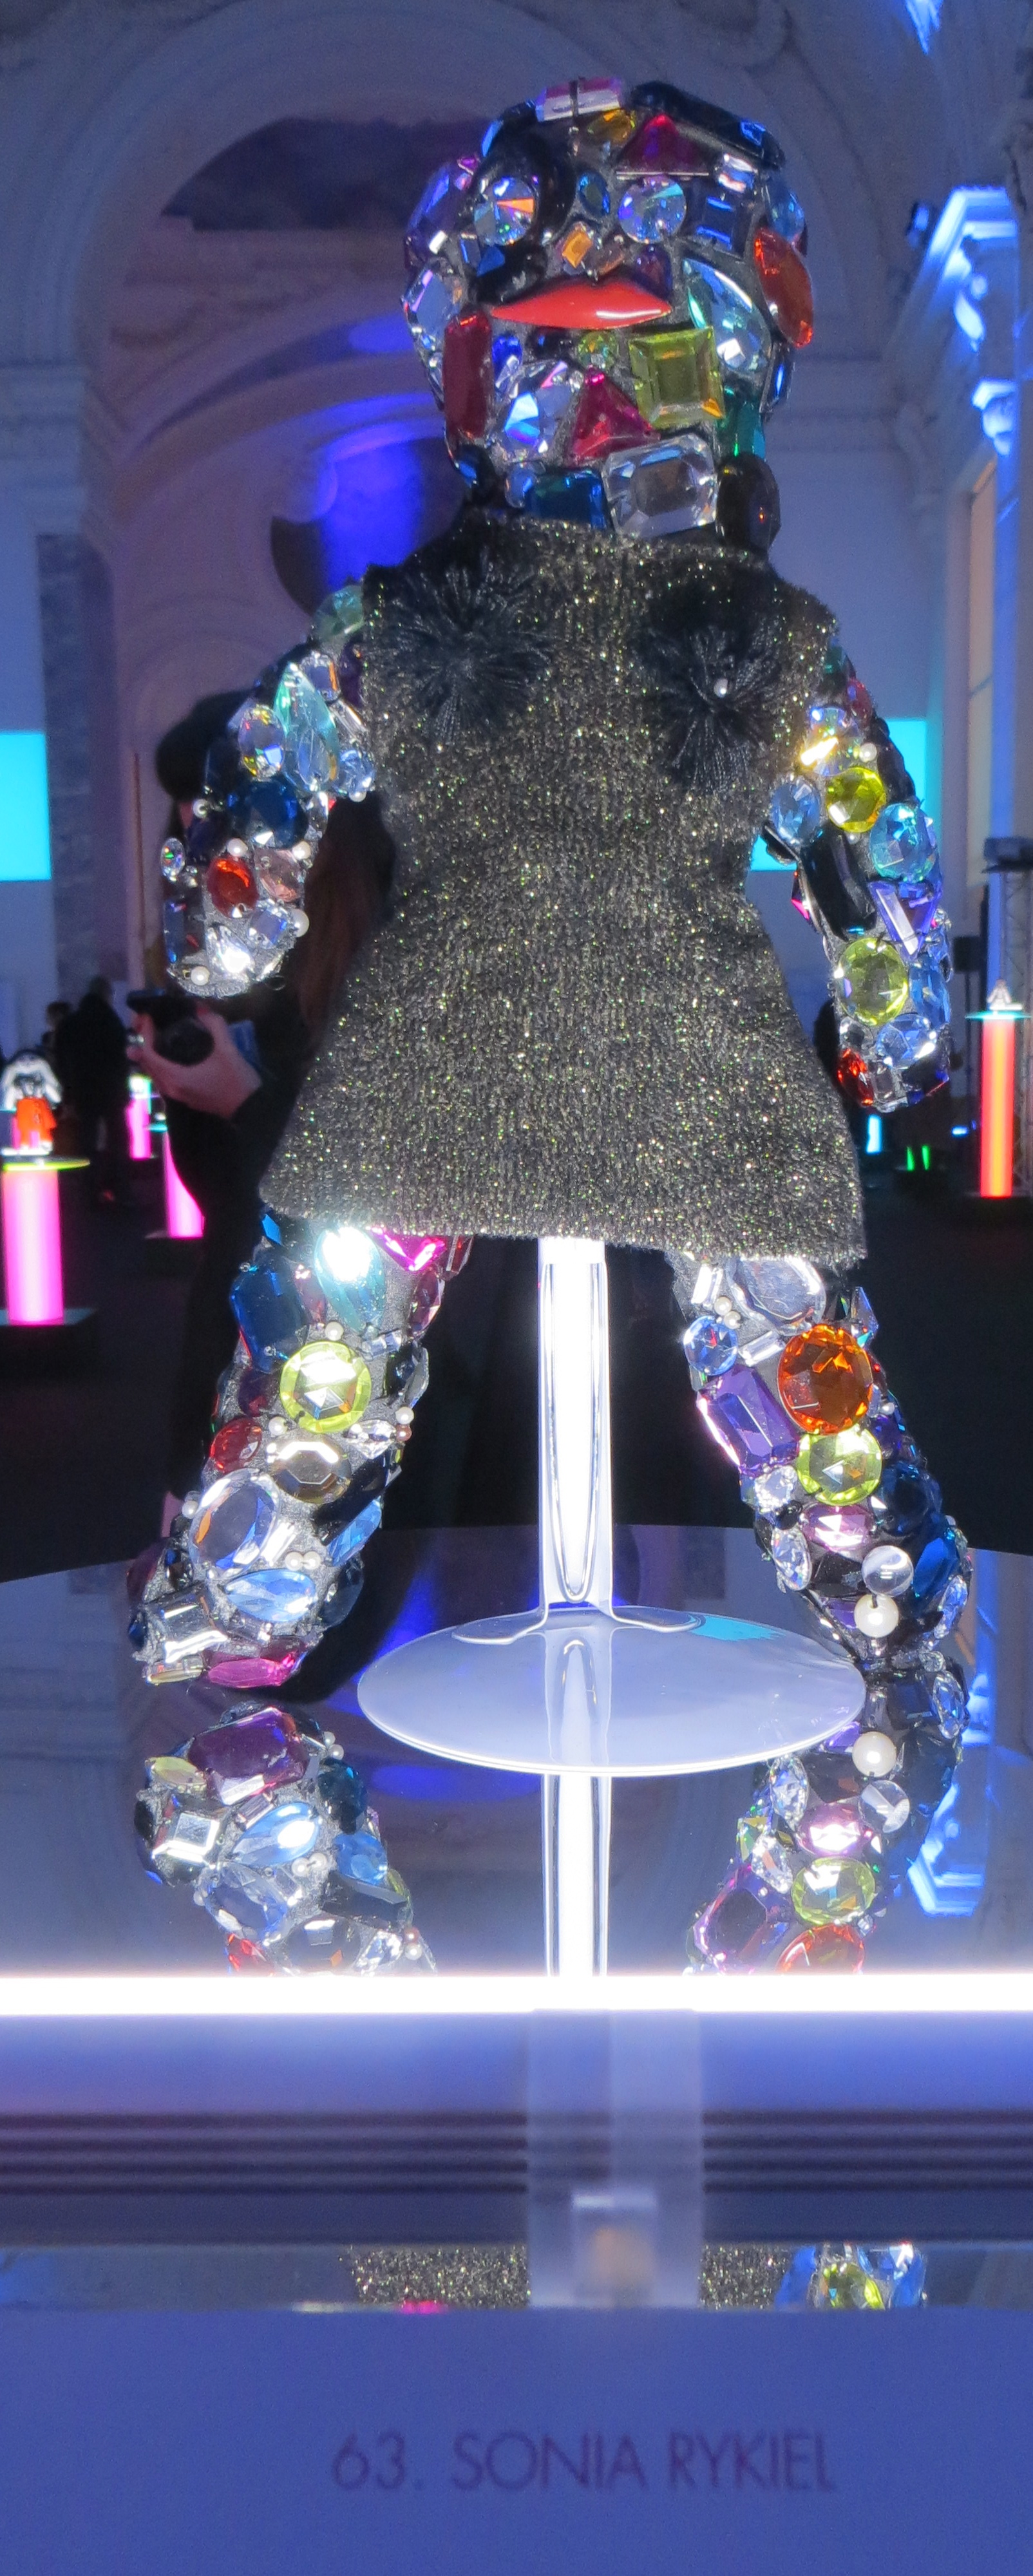 Sonia Rykiel doll 2012